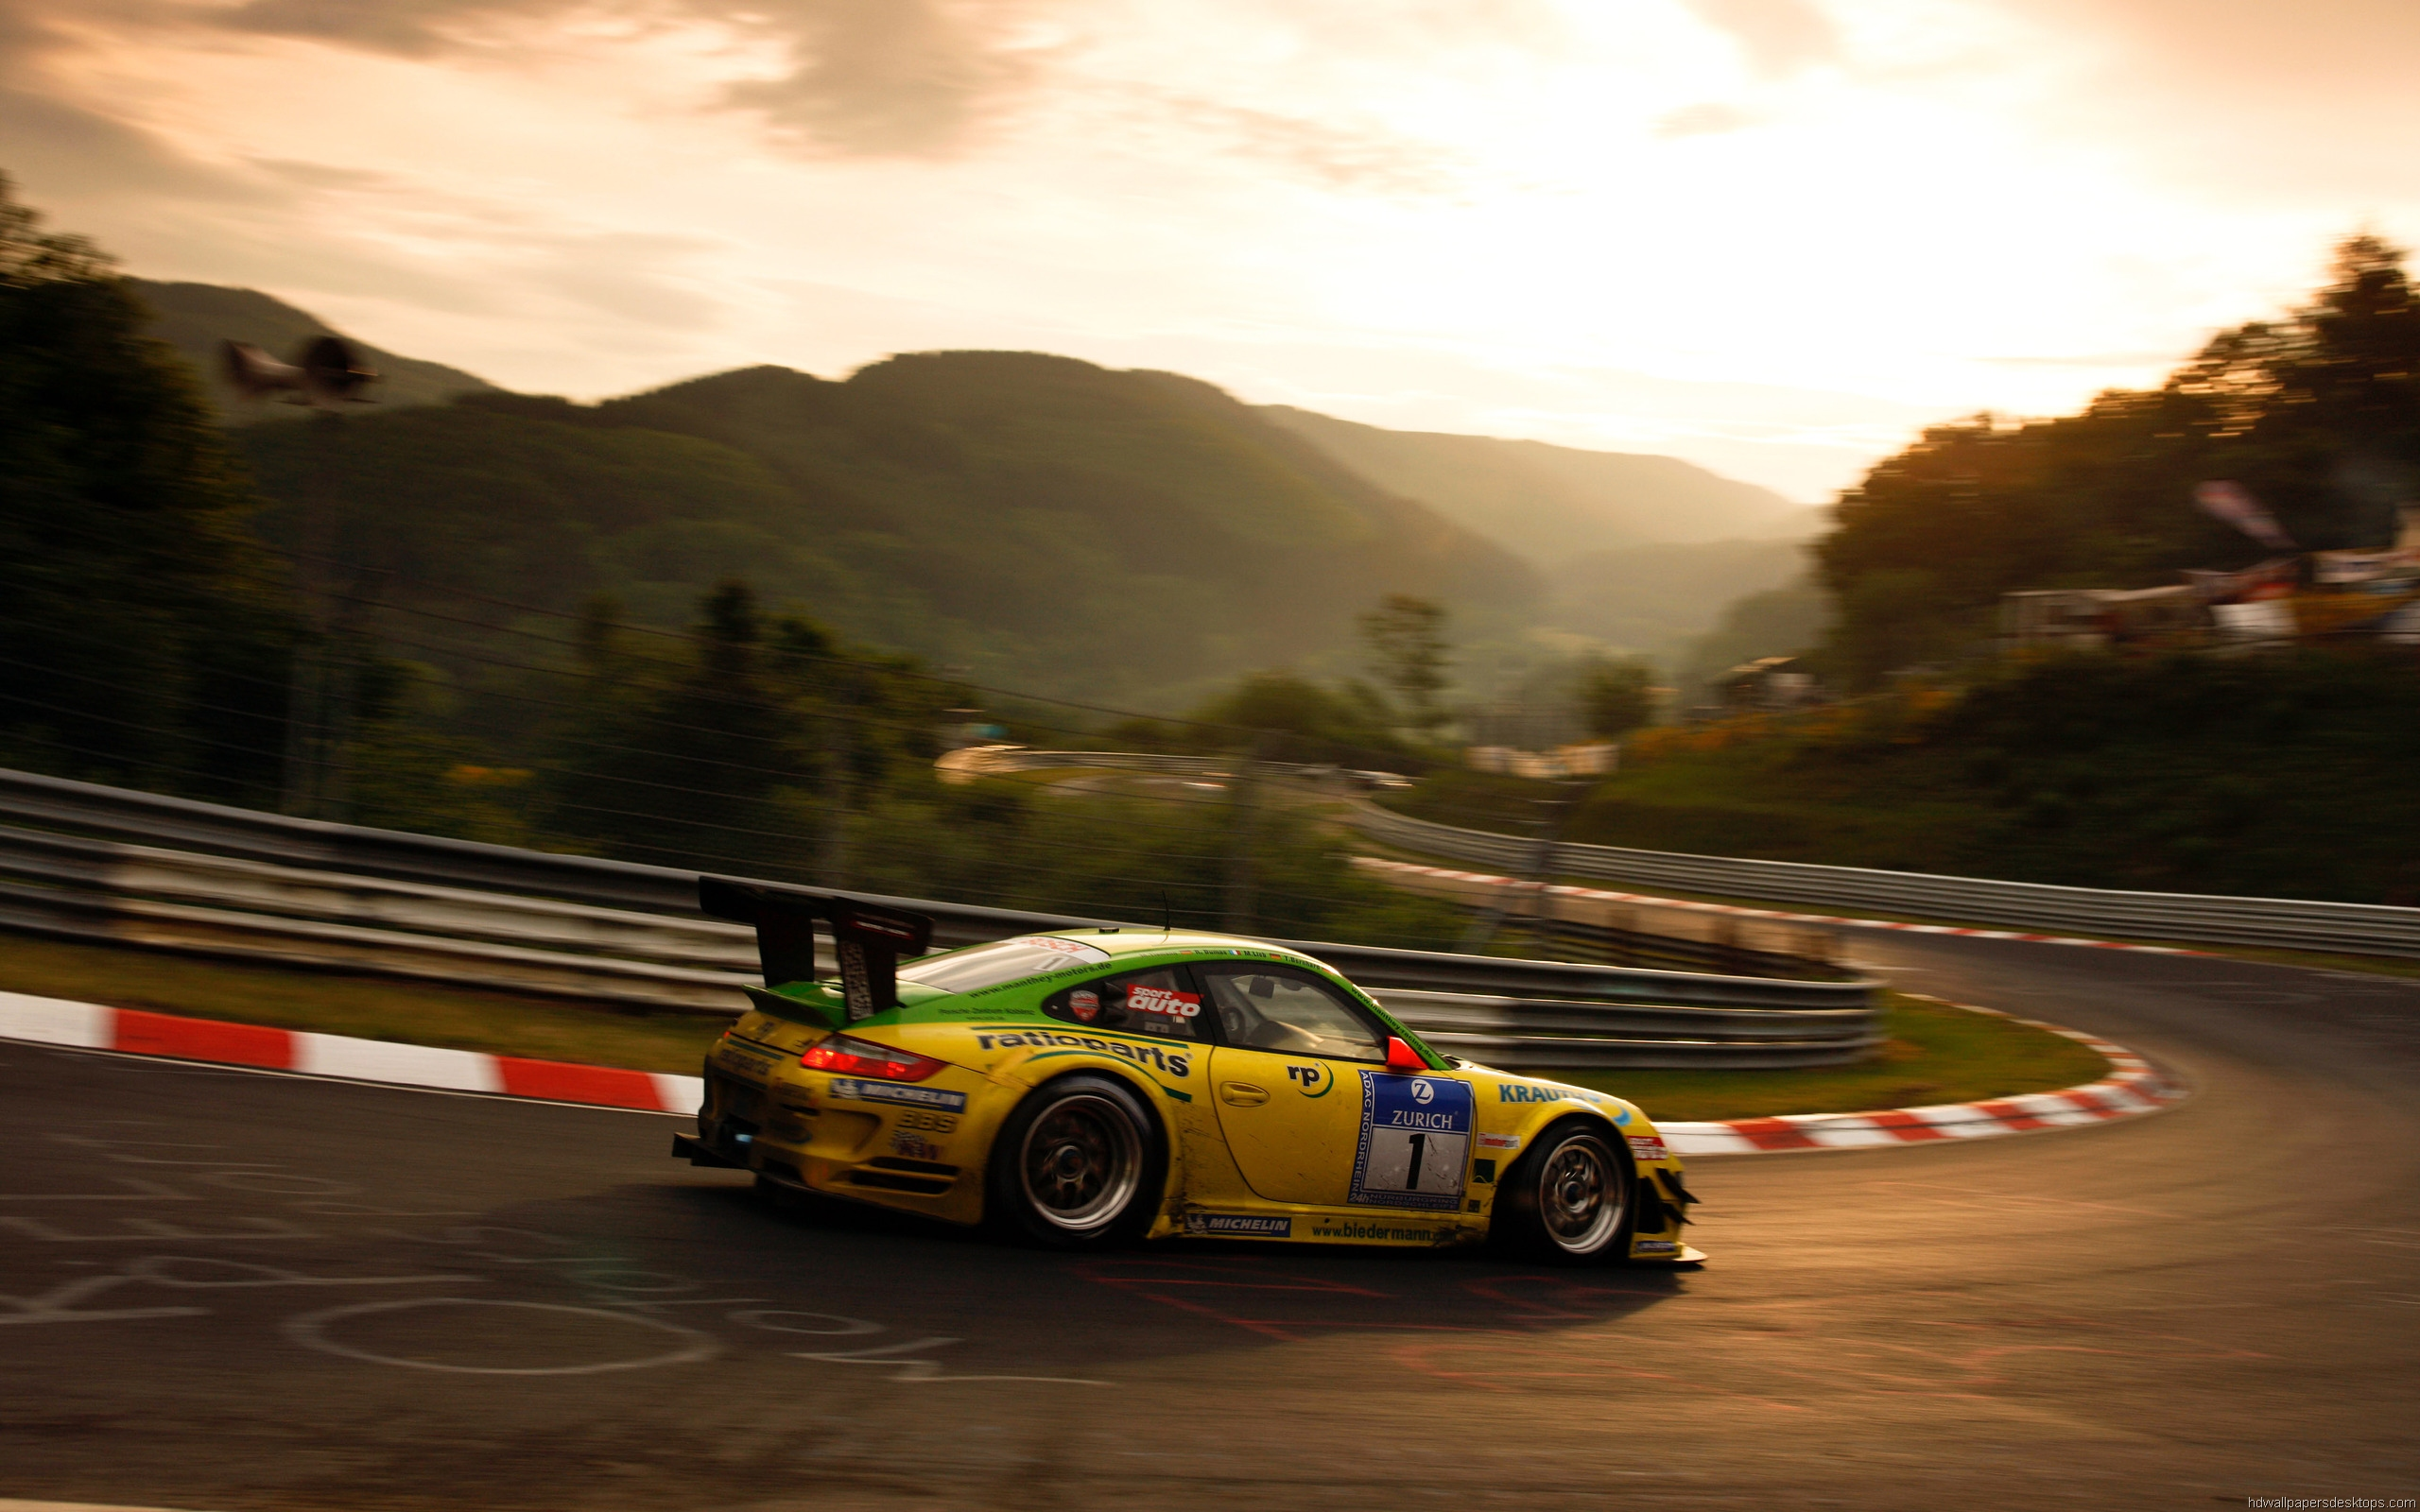 Cars Wallpapers HD Full HD 1080p Desktop Backgrounds 2560x1600 2560x1600